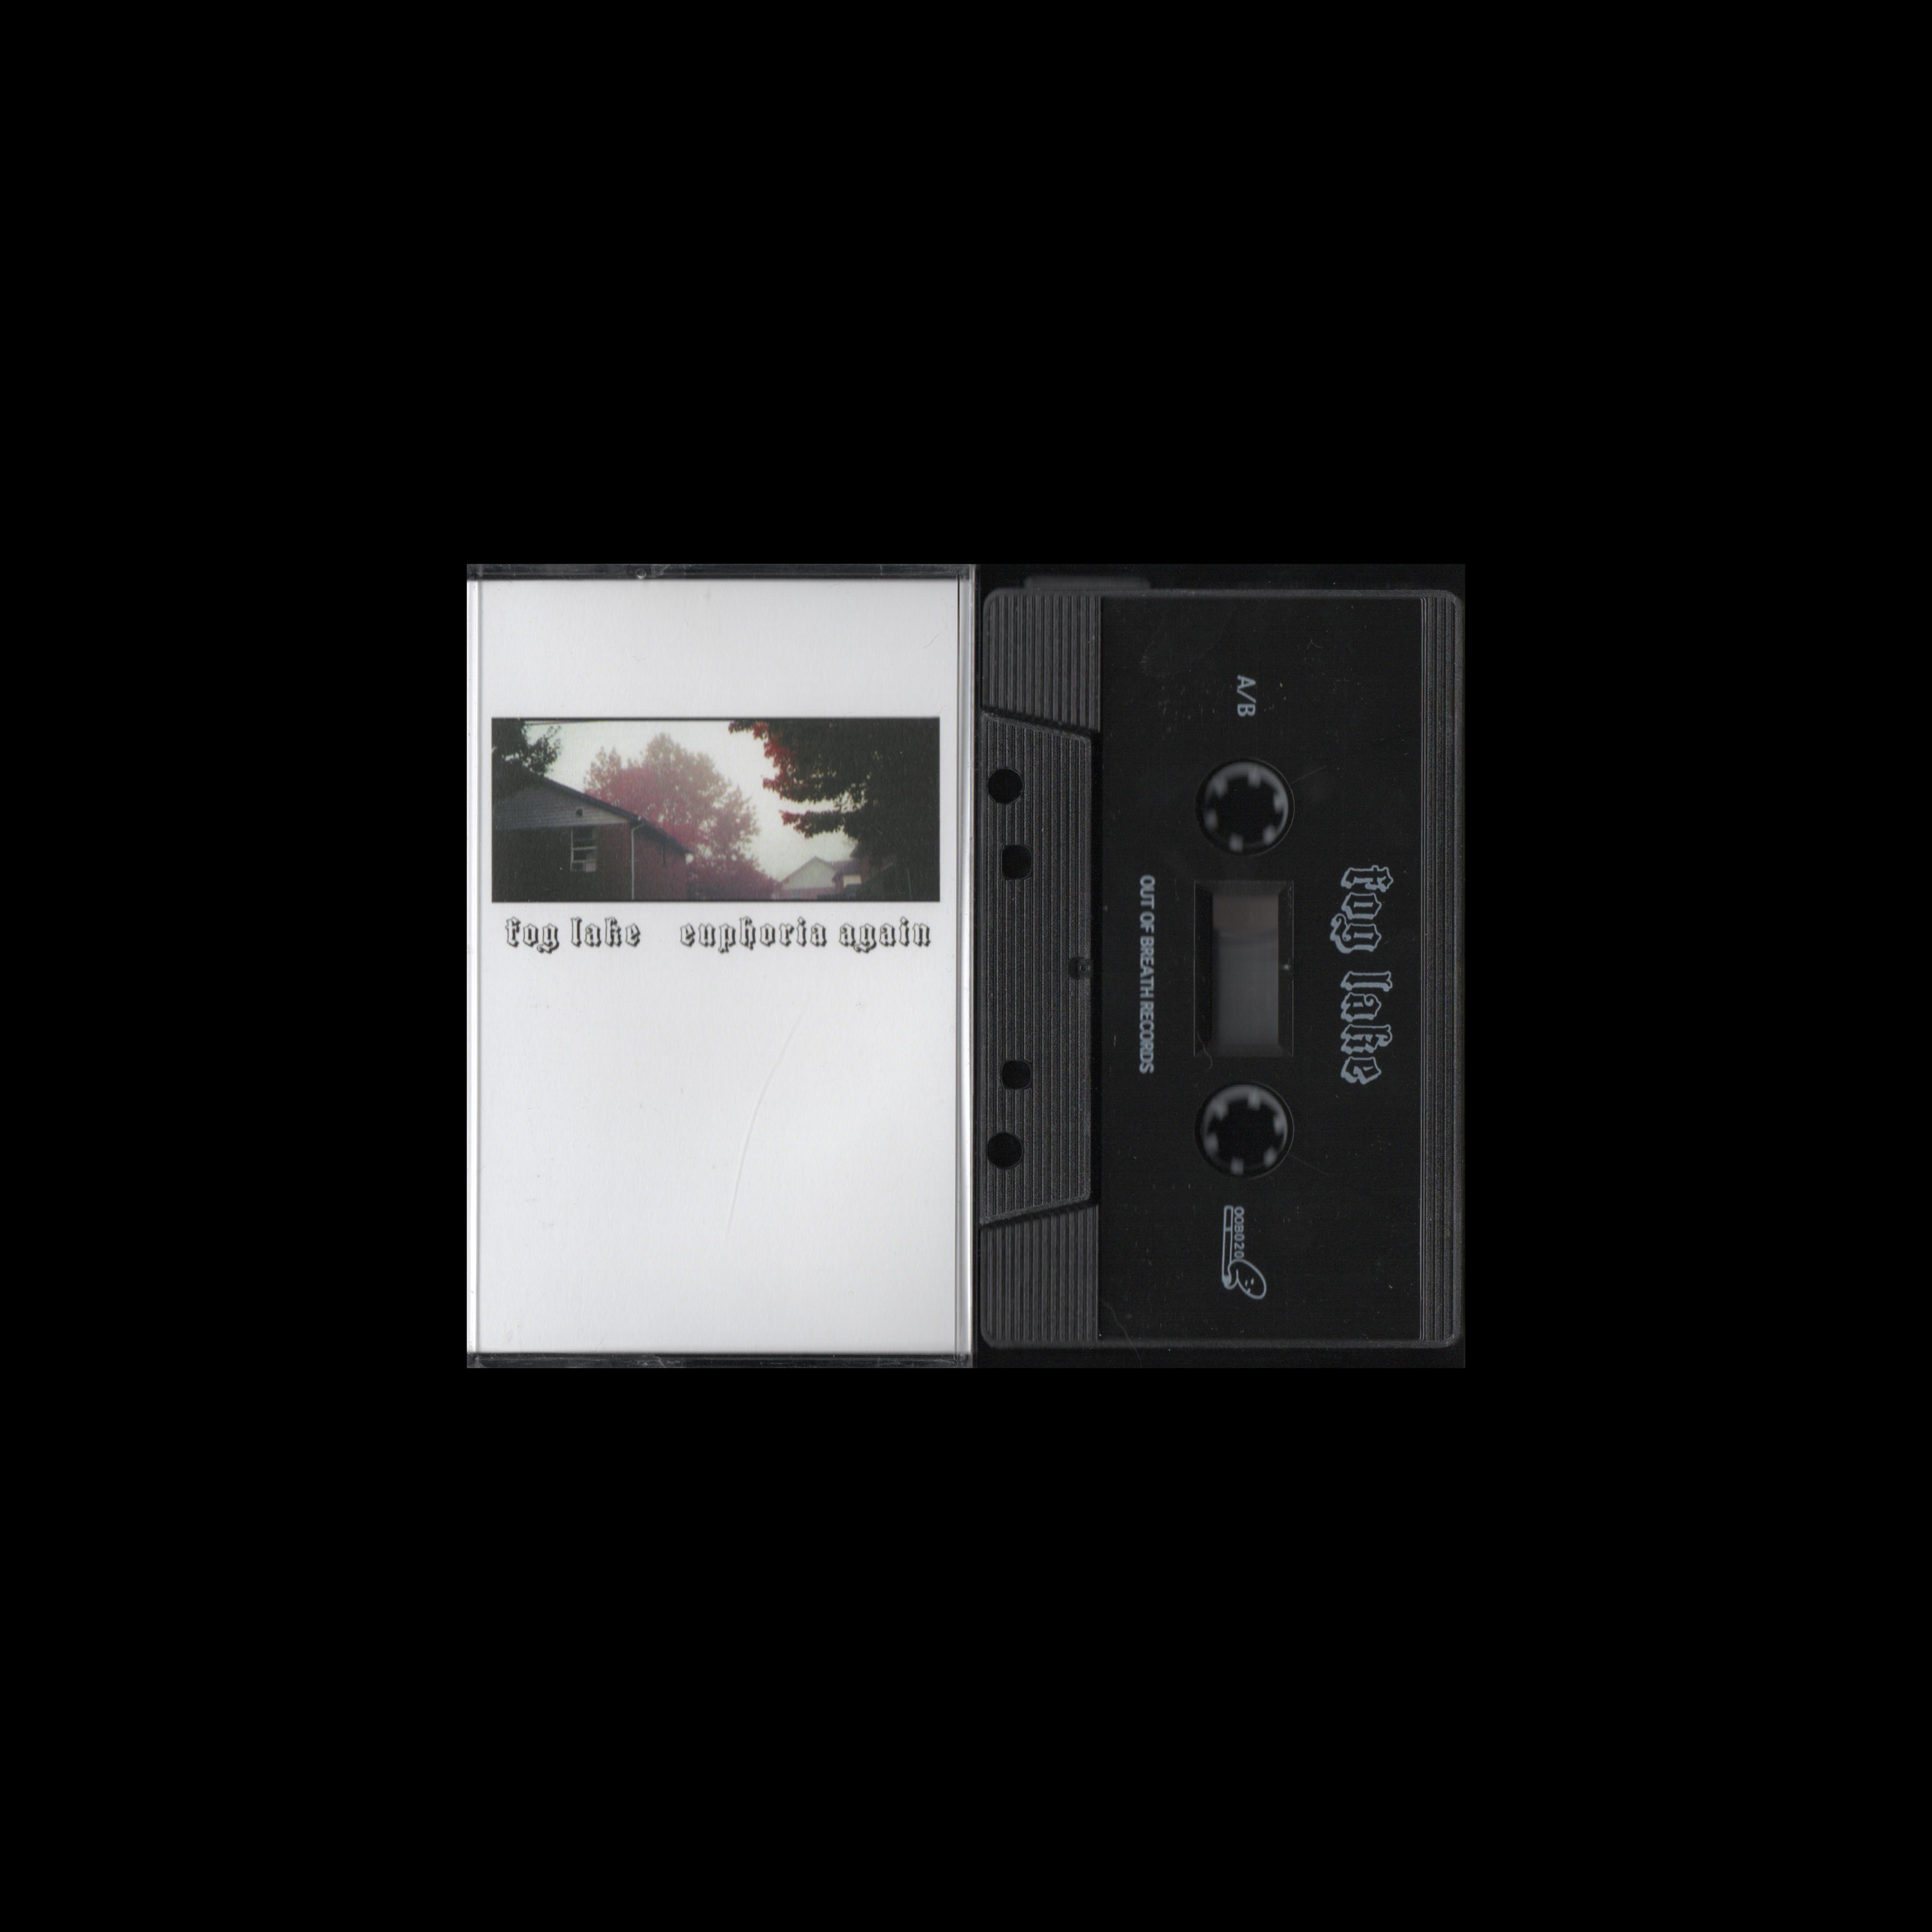 Fog Lake / Euphoria Again (Out Of Breath Records)